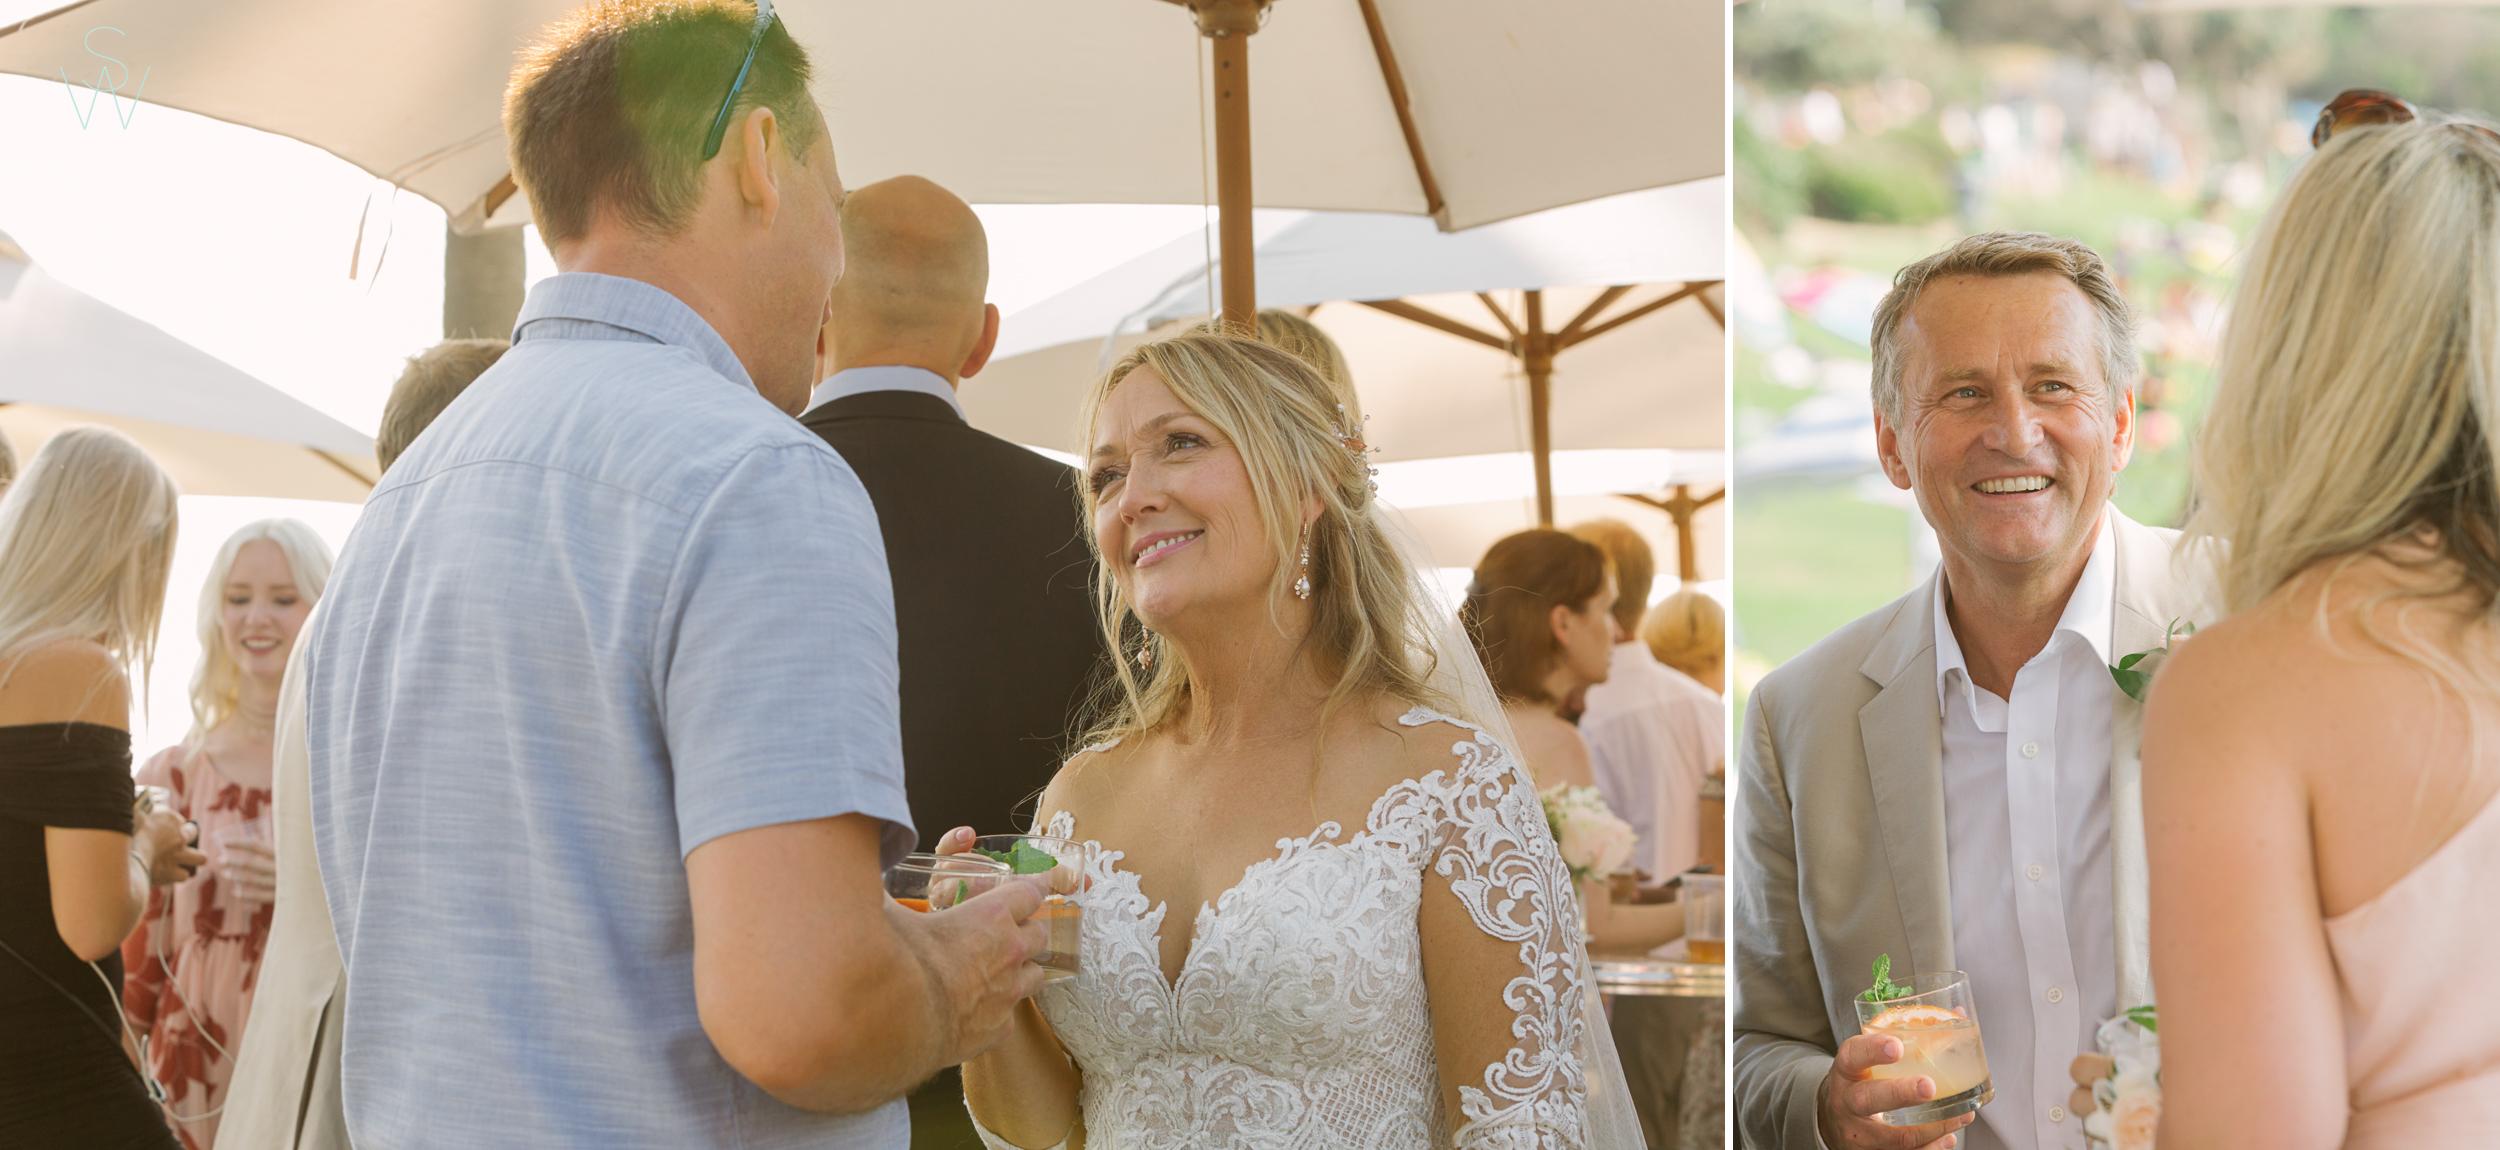 137DEL.MAR.WEDDINGS.photography.shewanders.JPG